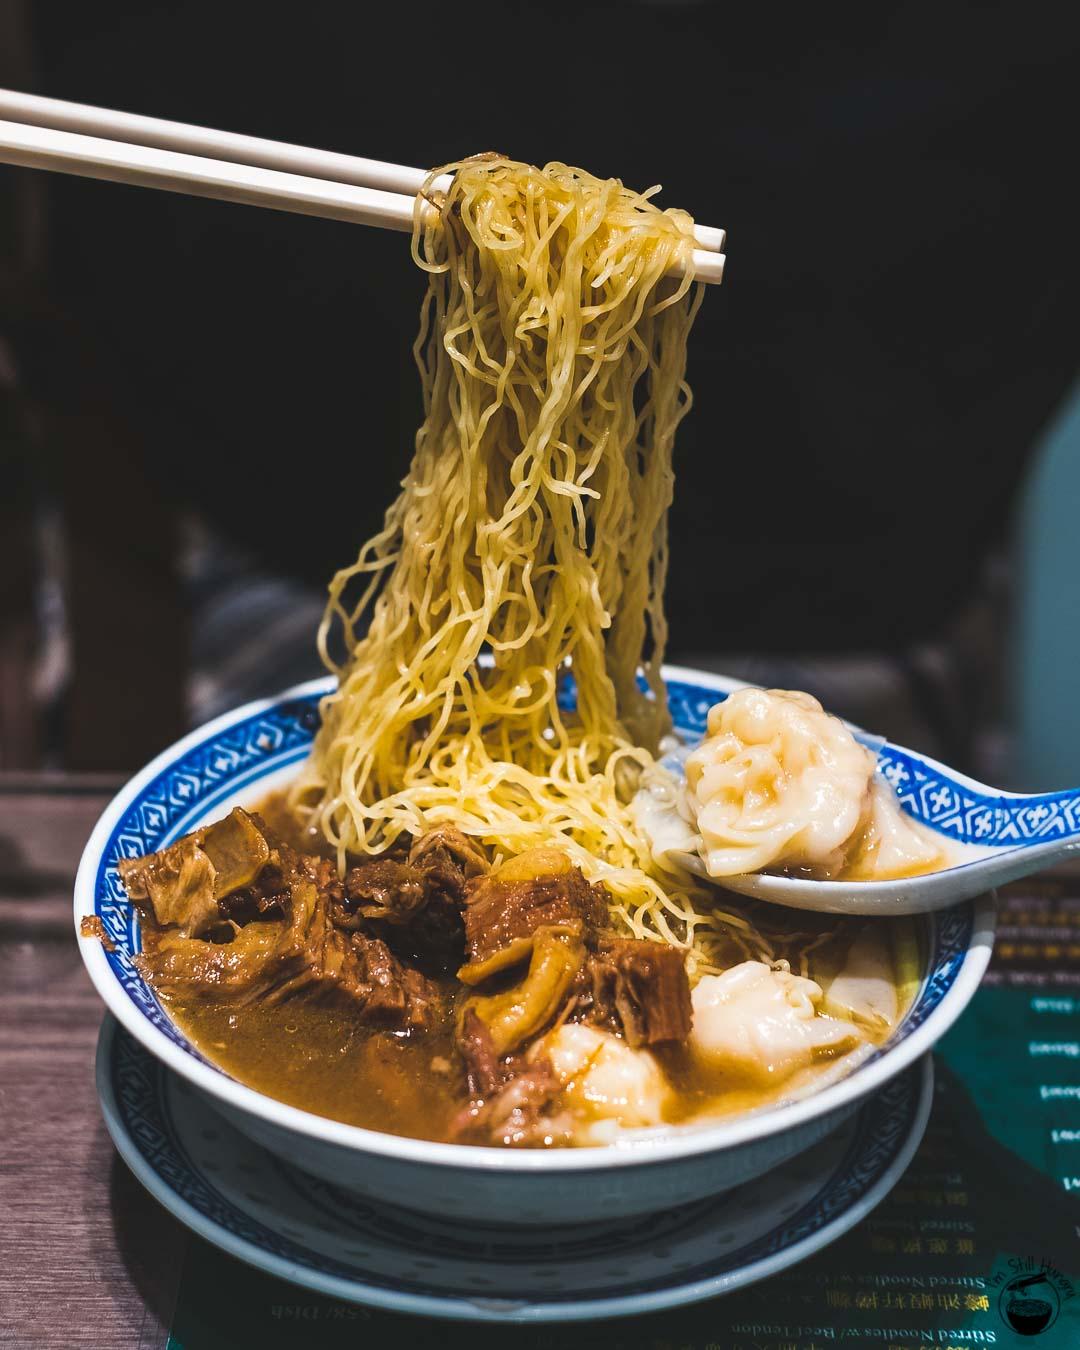 Mak's Noodle Hong Kong Beef brisket & wonton noodles